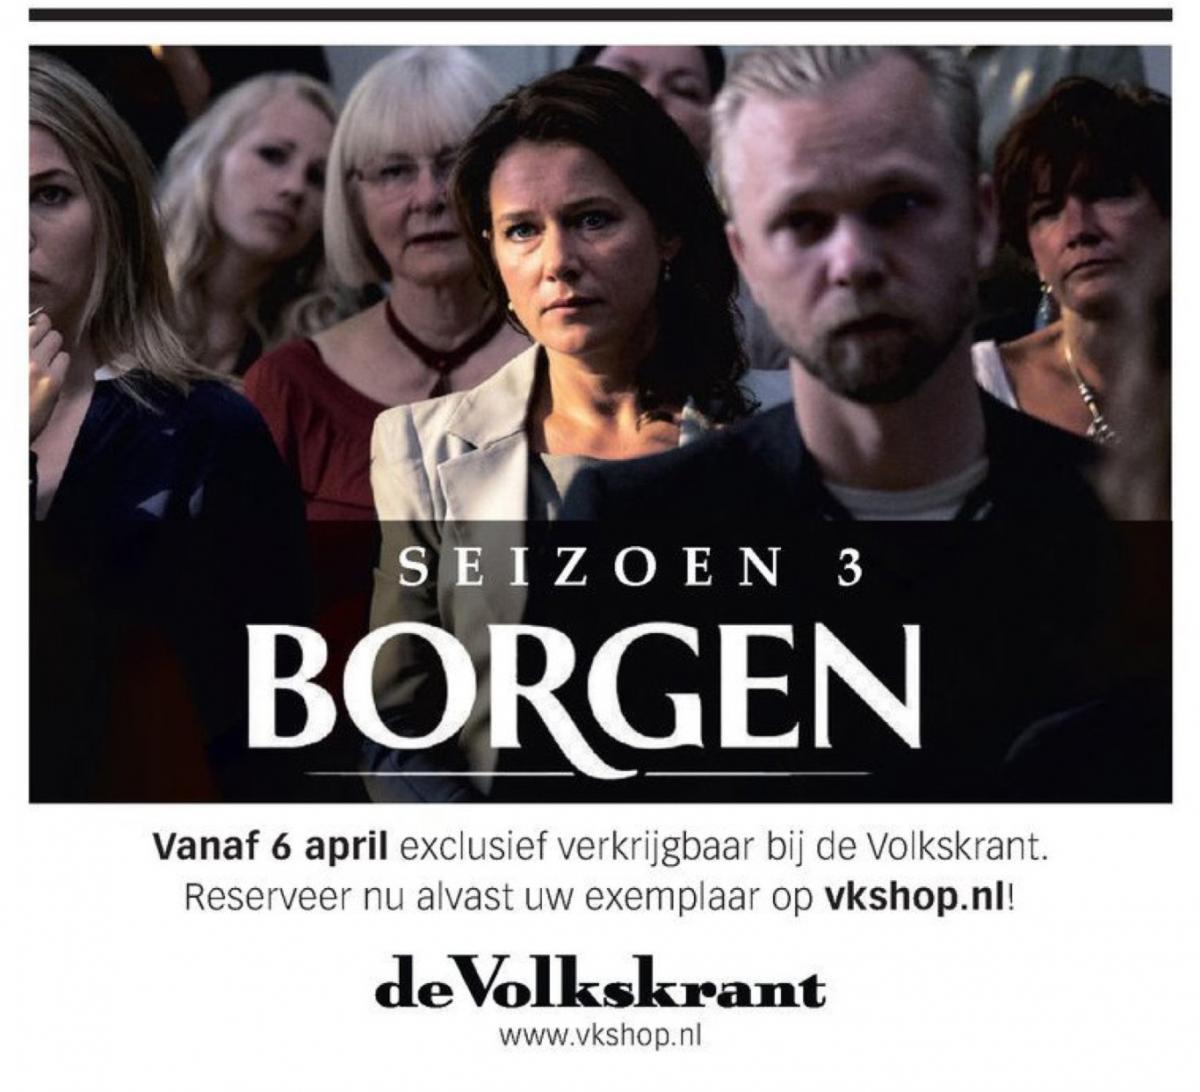 Borgen Season 3 - Page 18 - TV Shows - Sub-Talk net - TV